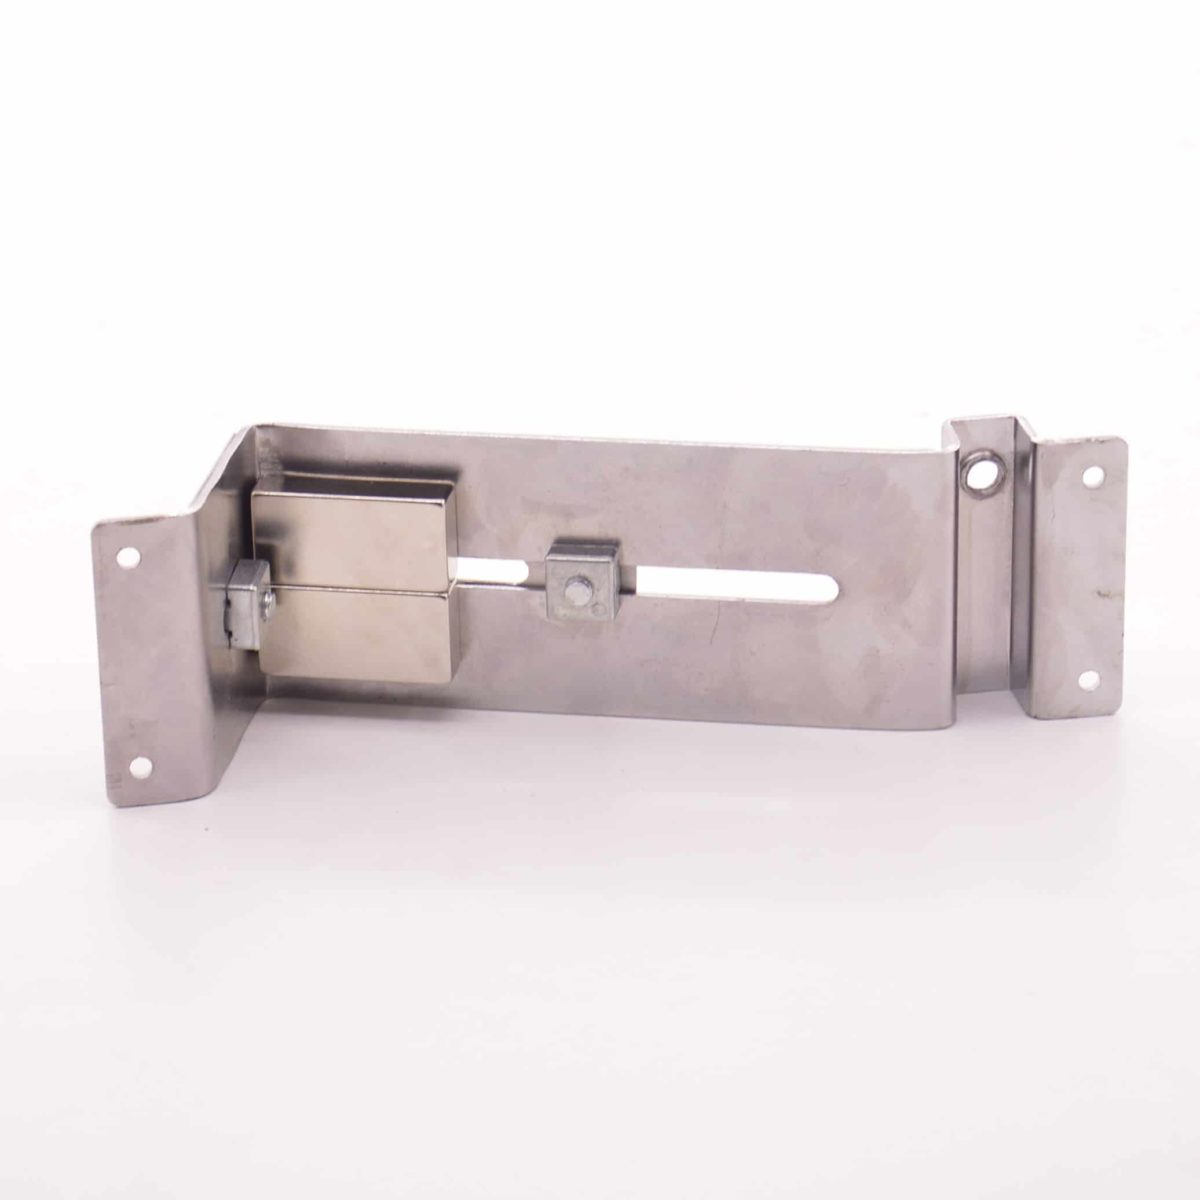 Неодимовый магнит 40х20х10мм для точилок Ruixin и Edge Pro Apex 4